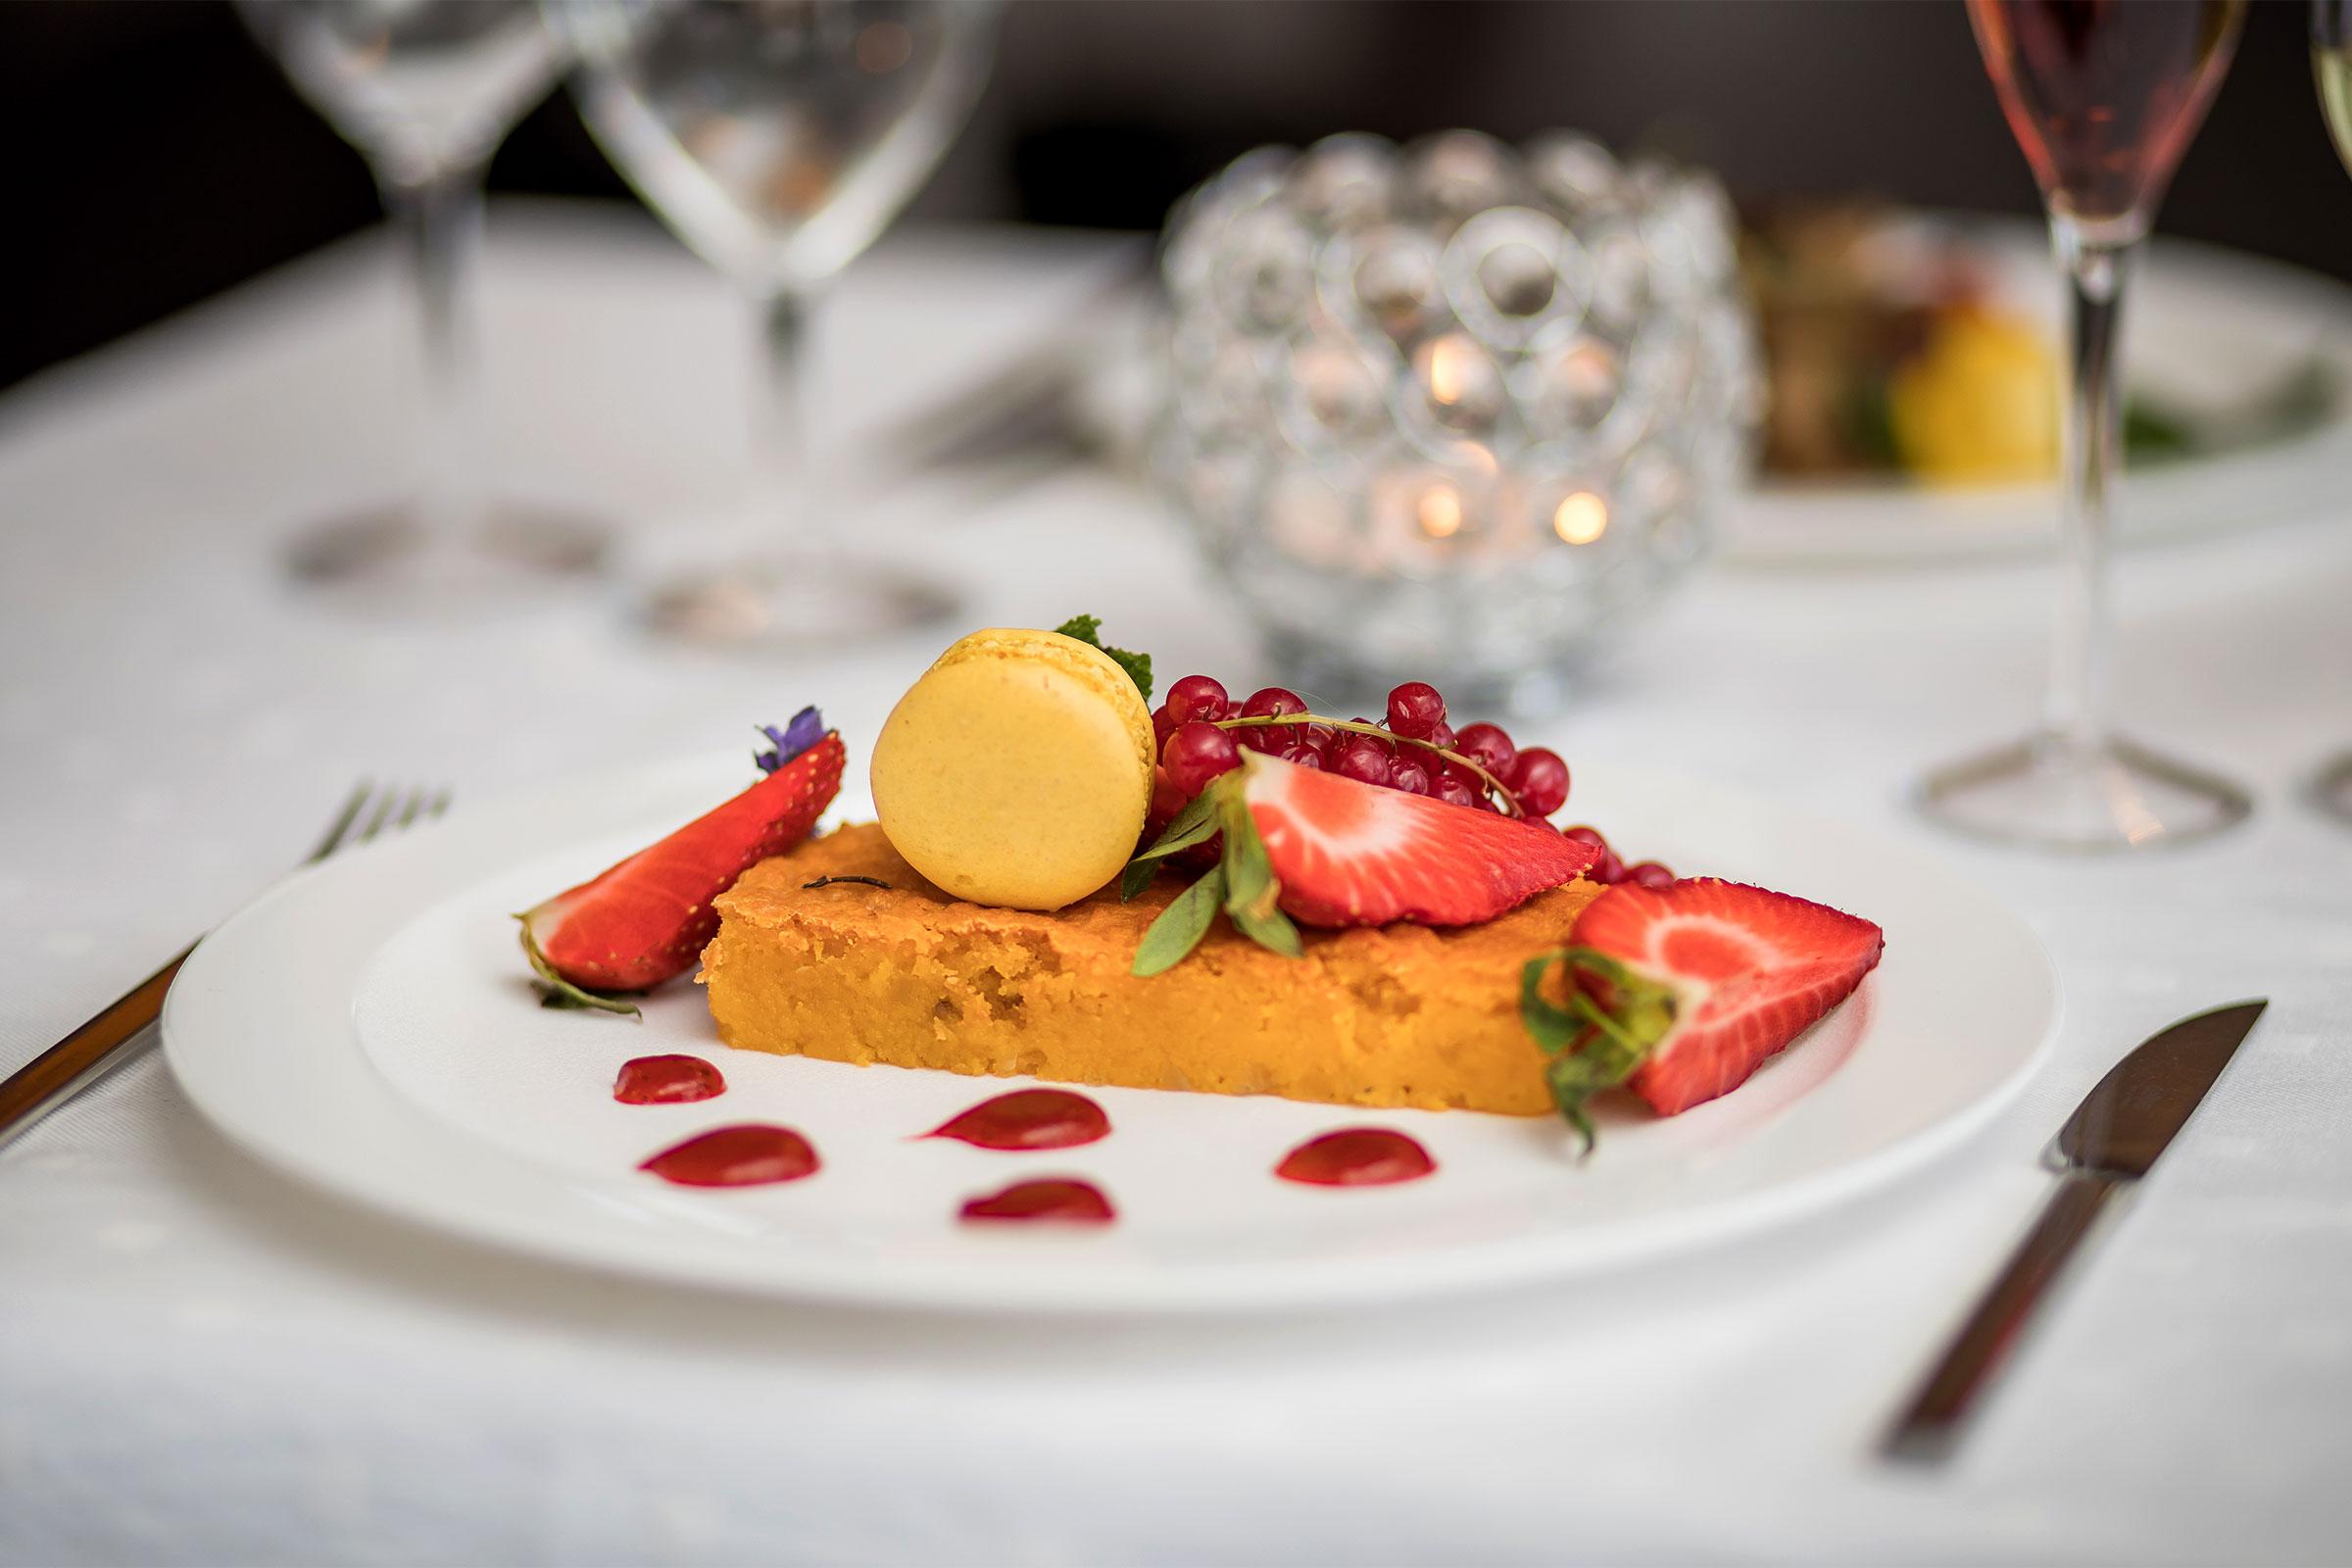 Sobremesa - Restaurante D. Dinis - Lisotel Hotel & Spa